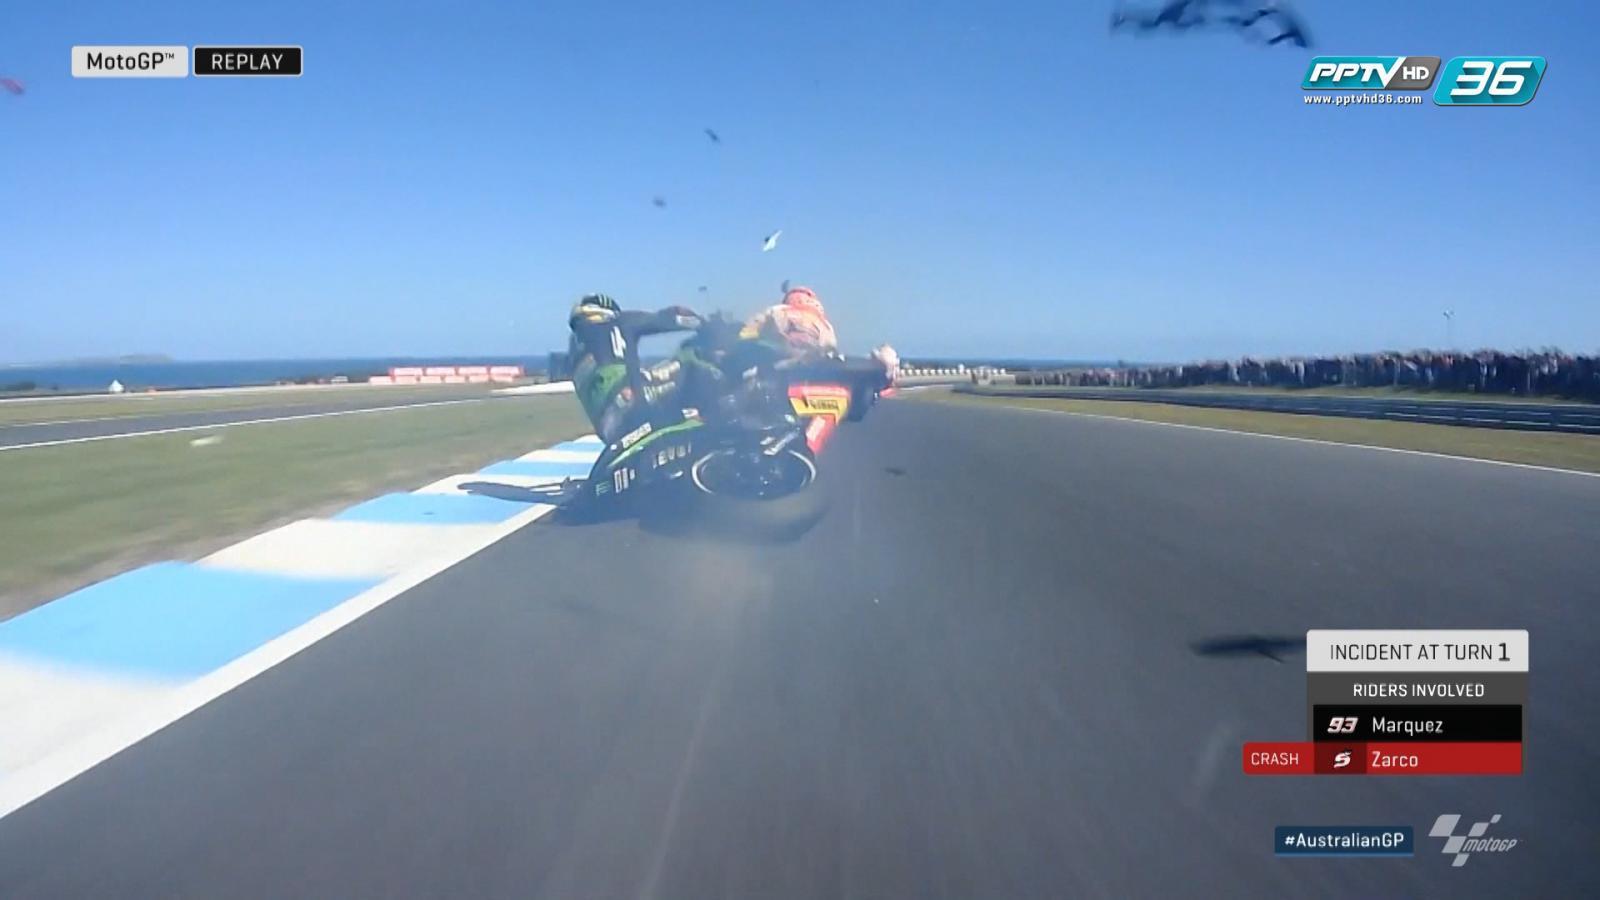 Johann Zarco ล้มหลังรถไปเกี่ยวล้อหลังของ Marc Marquez